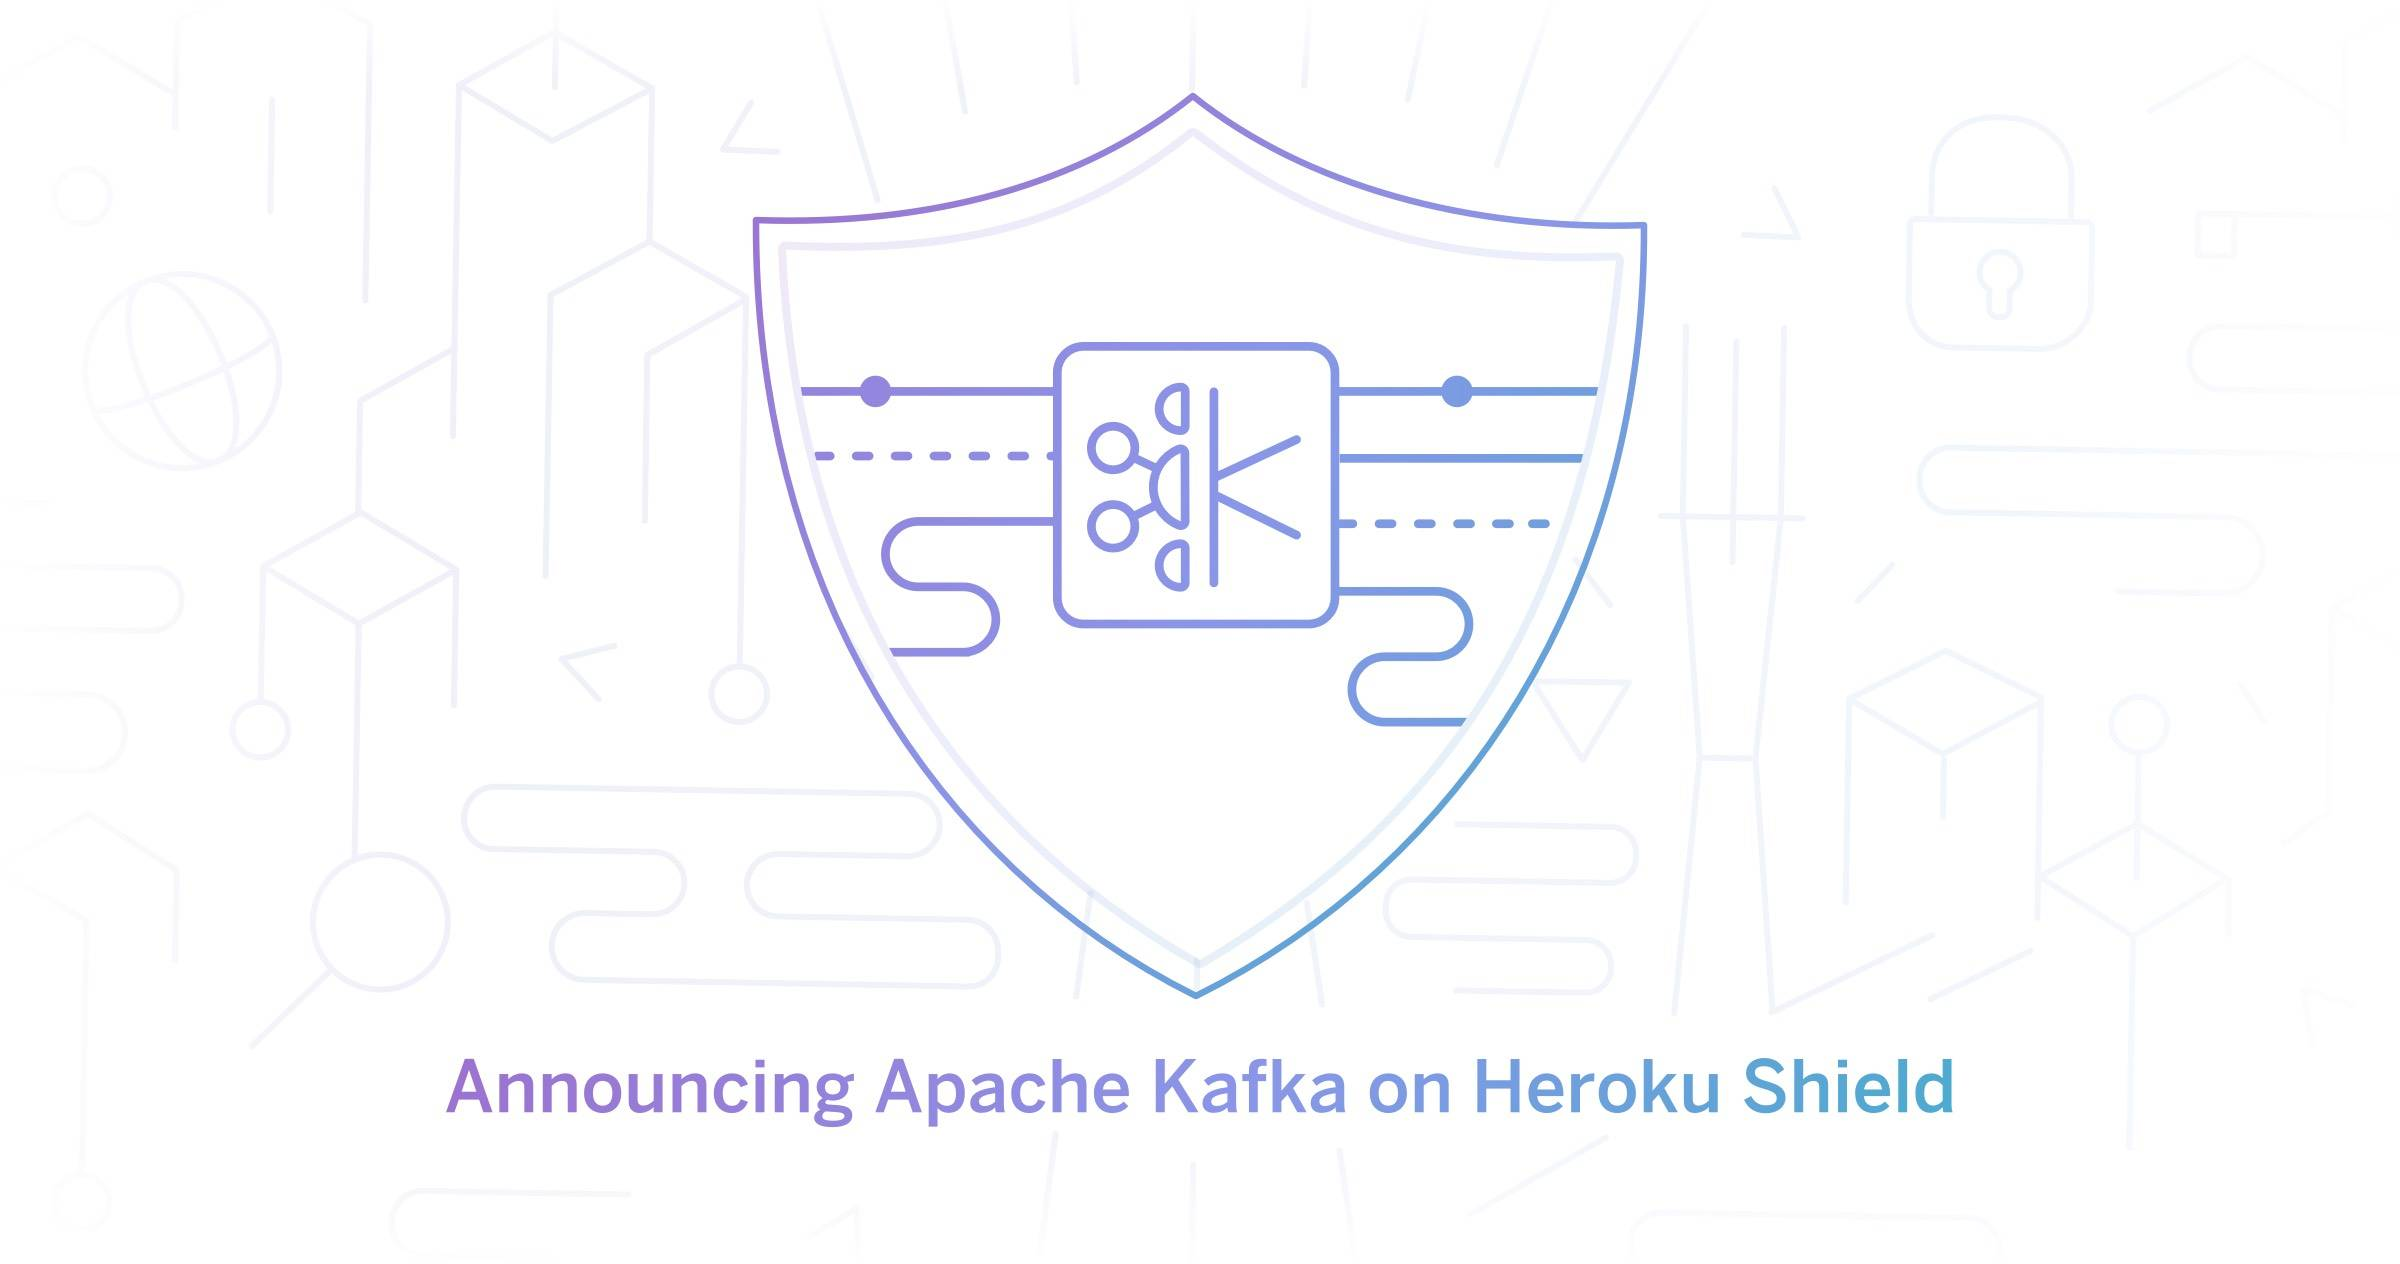 Announcing Apache Kafka on Heroku Shield